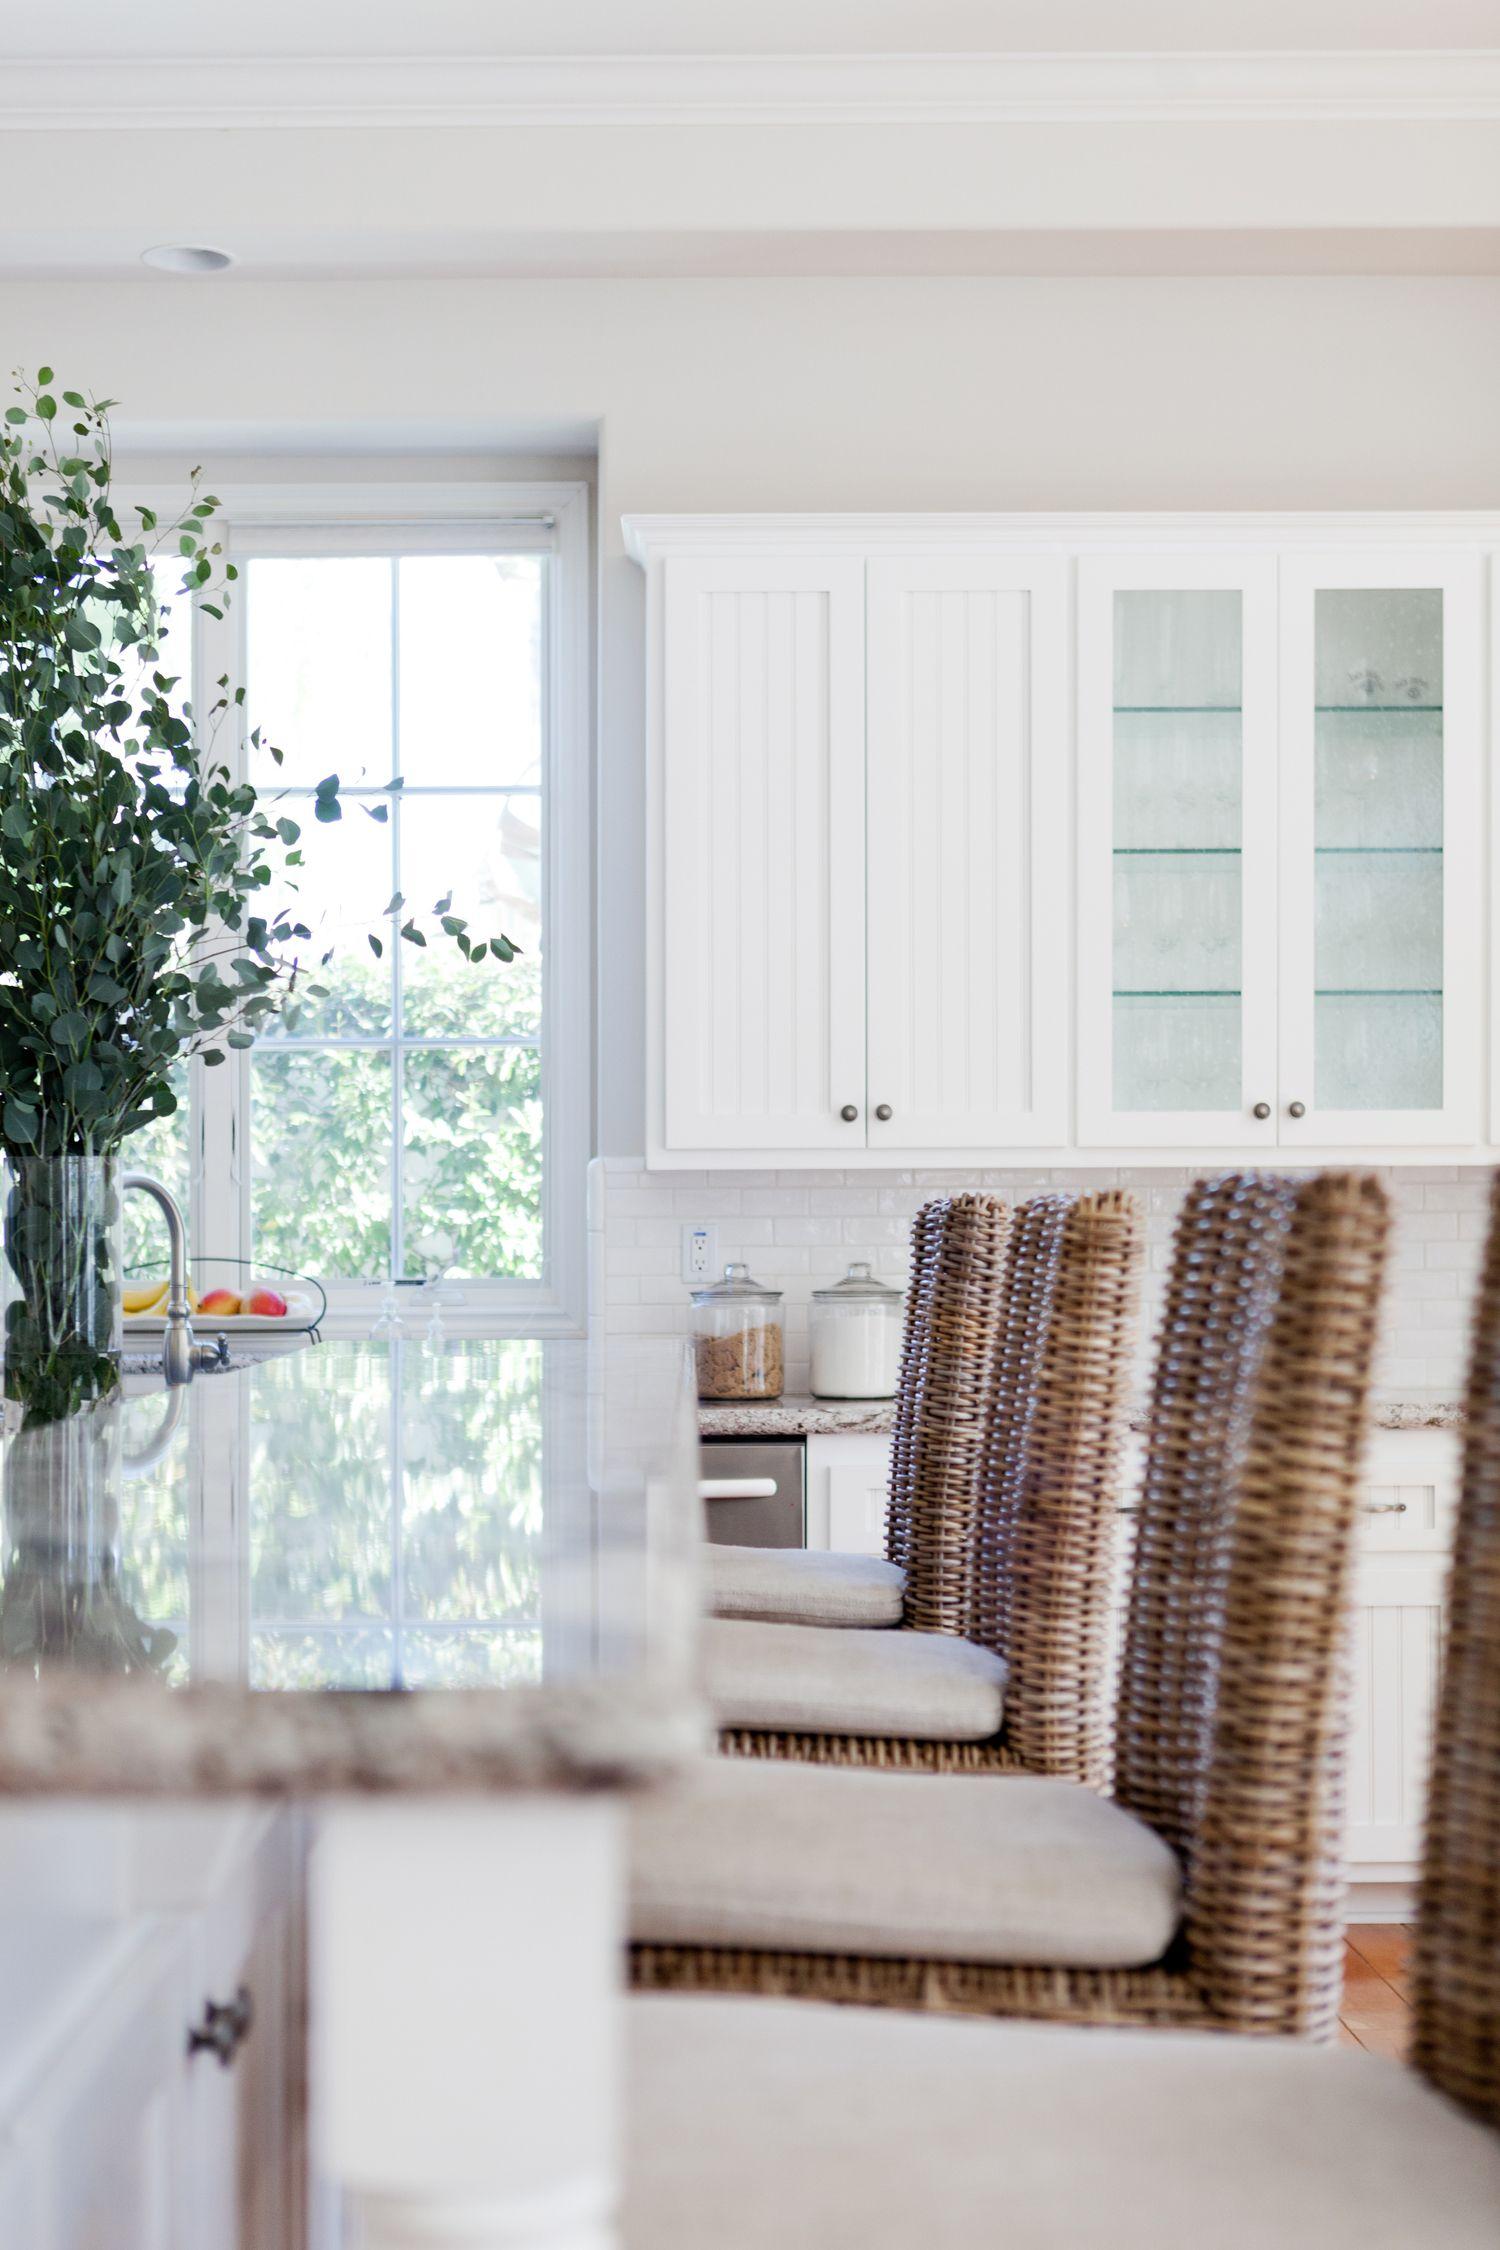 All White Kitchen Design With Wicker Bar Stools J Kurtz Design Modern Kitchen Interiors Kitchen Interior Design Modern New Kitchen Designs